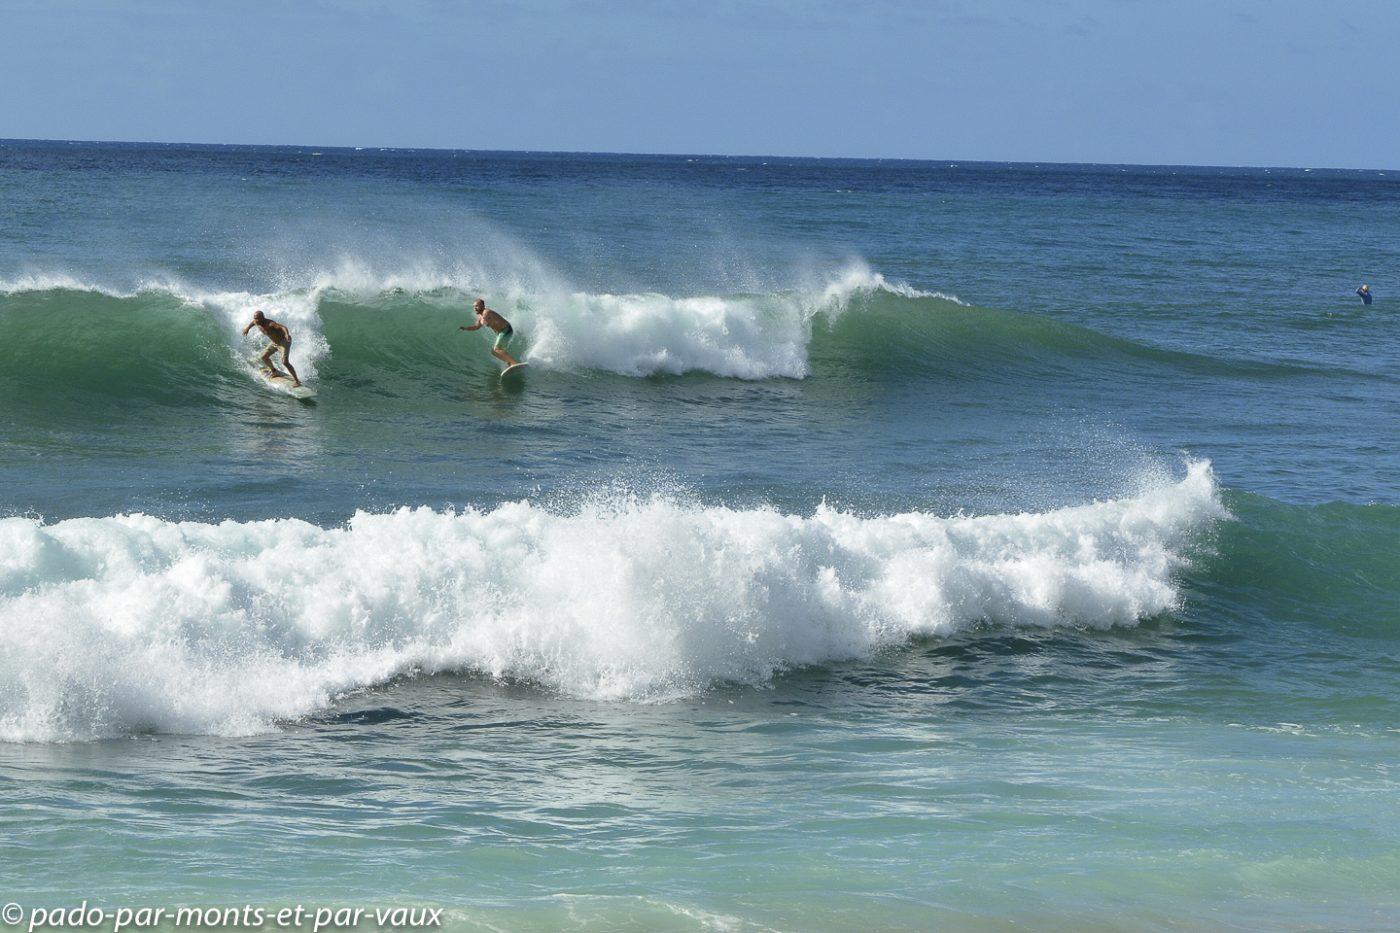 Oahu - North Shore - Banzai pipeline